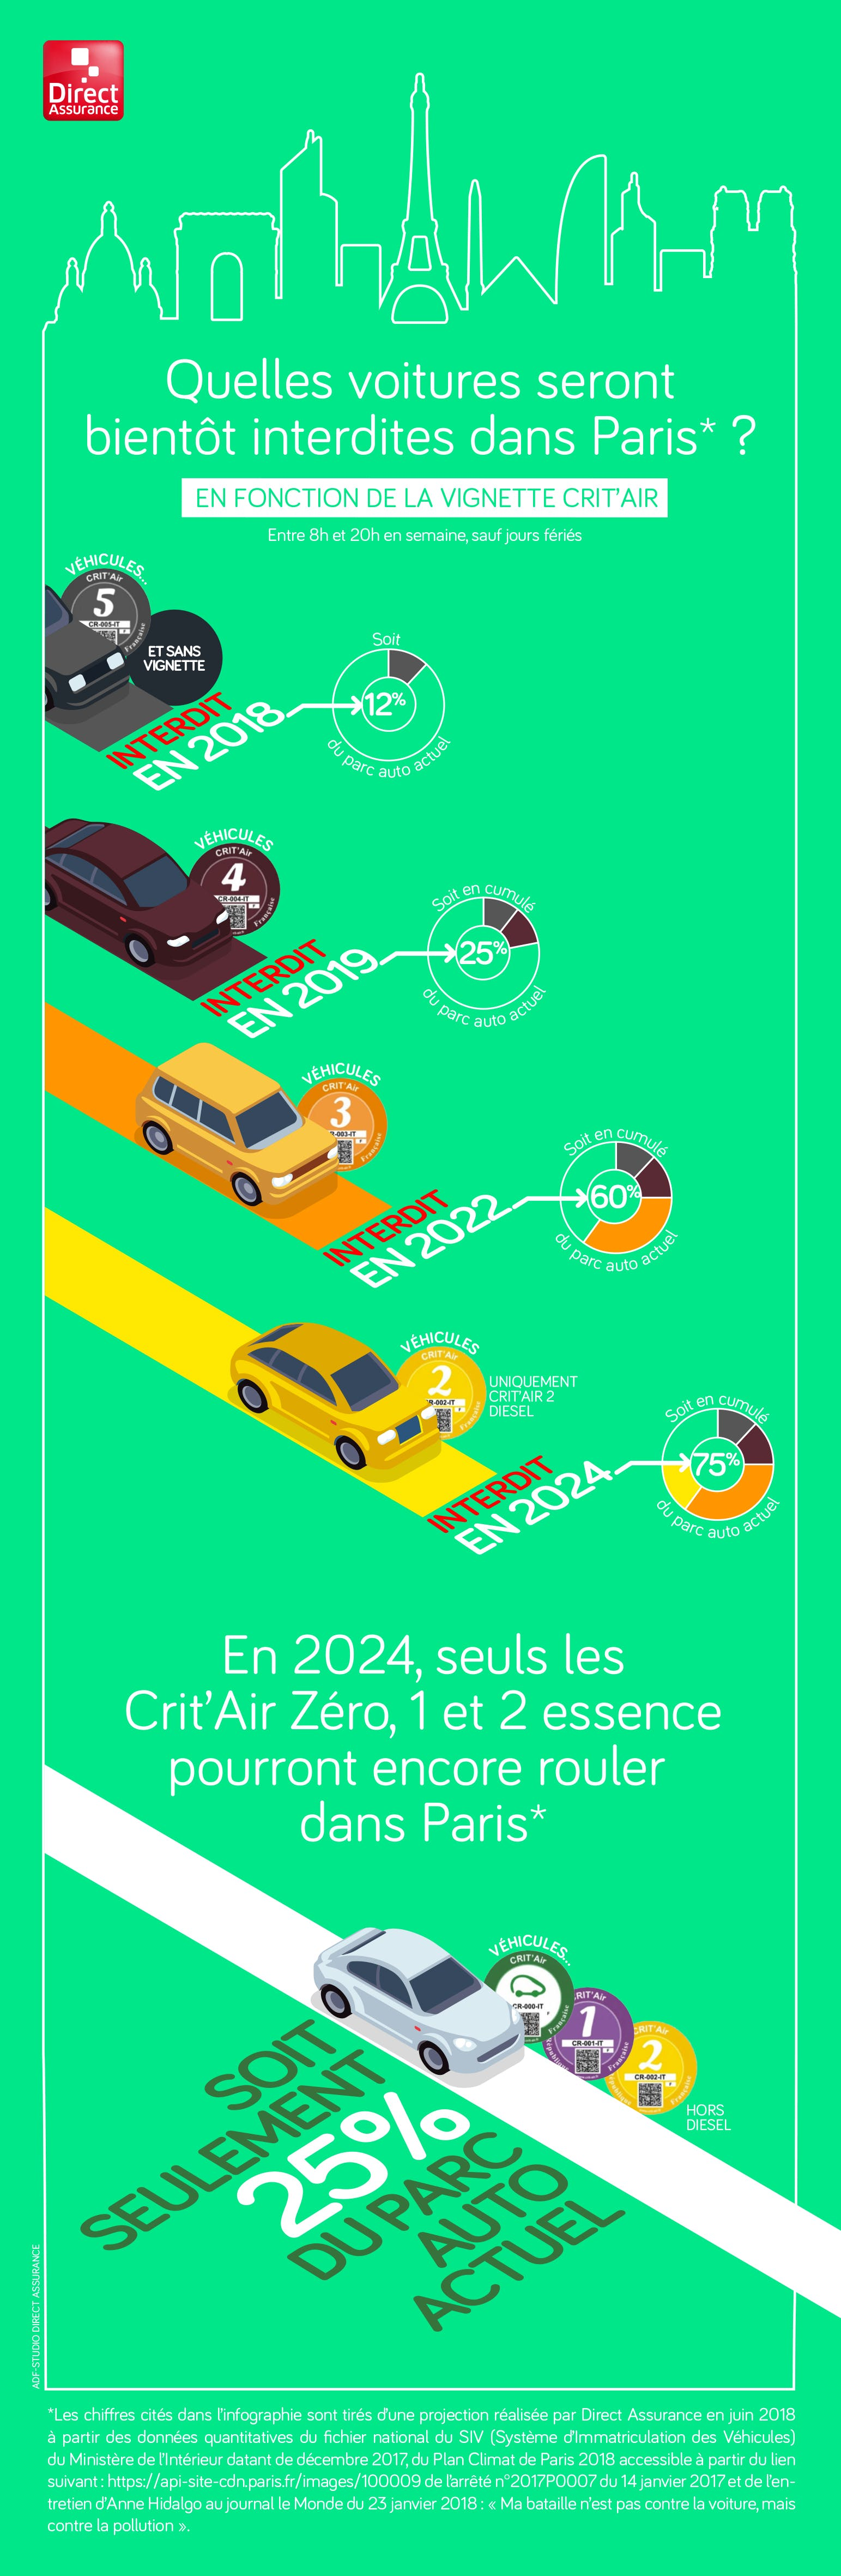 Quelles voitures seront bientôt interdites de circulation dans Paris ? en 2018, en 2019, en 2022, en 2024.